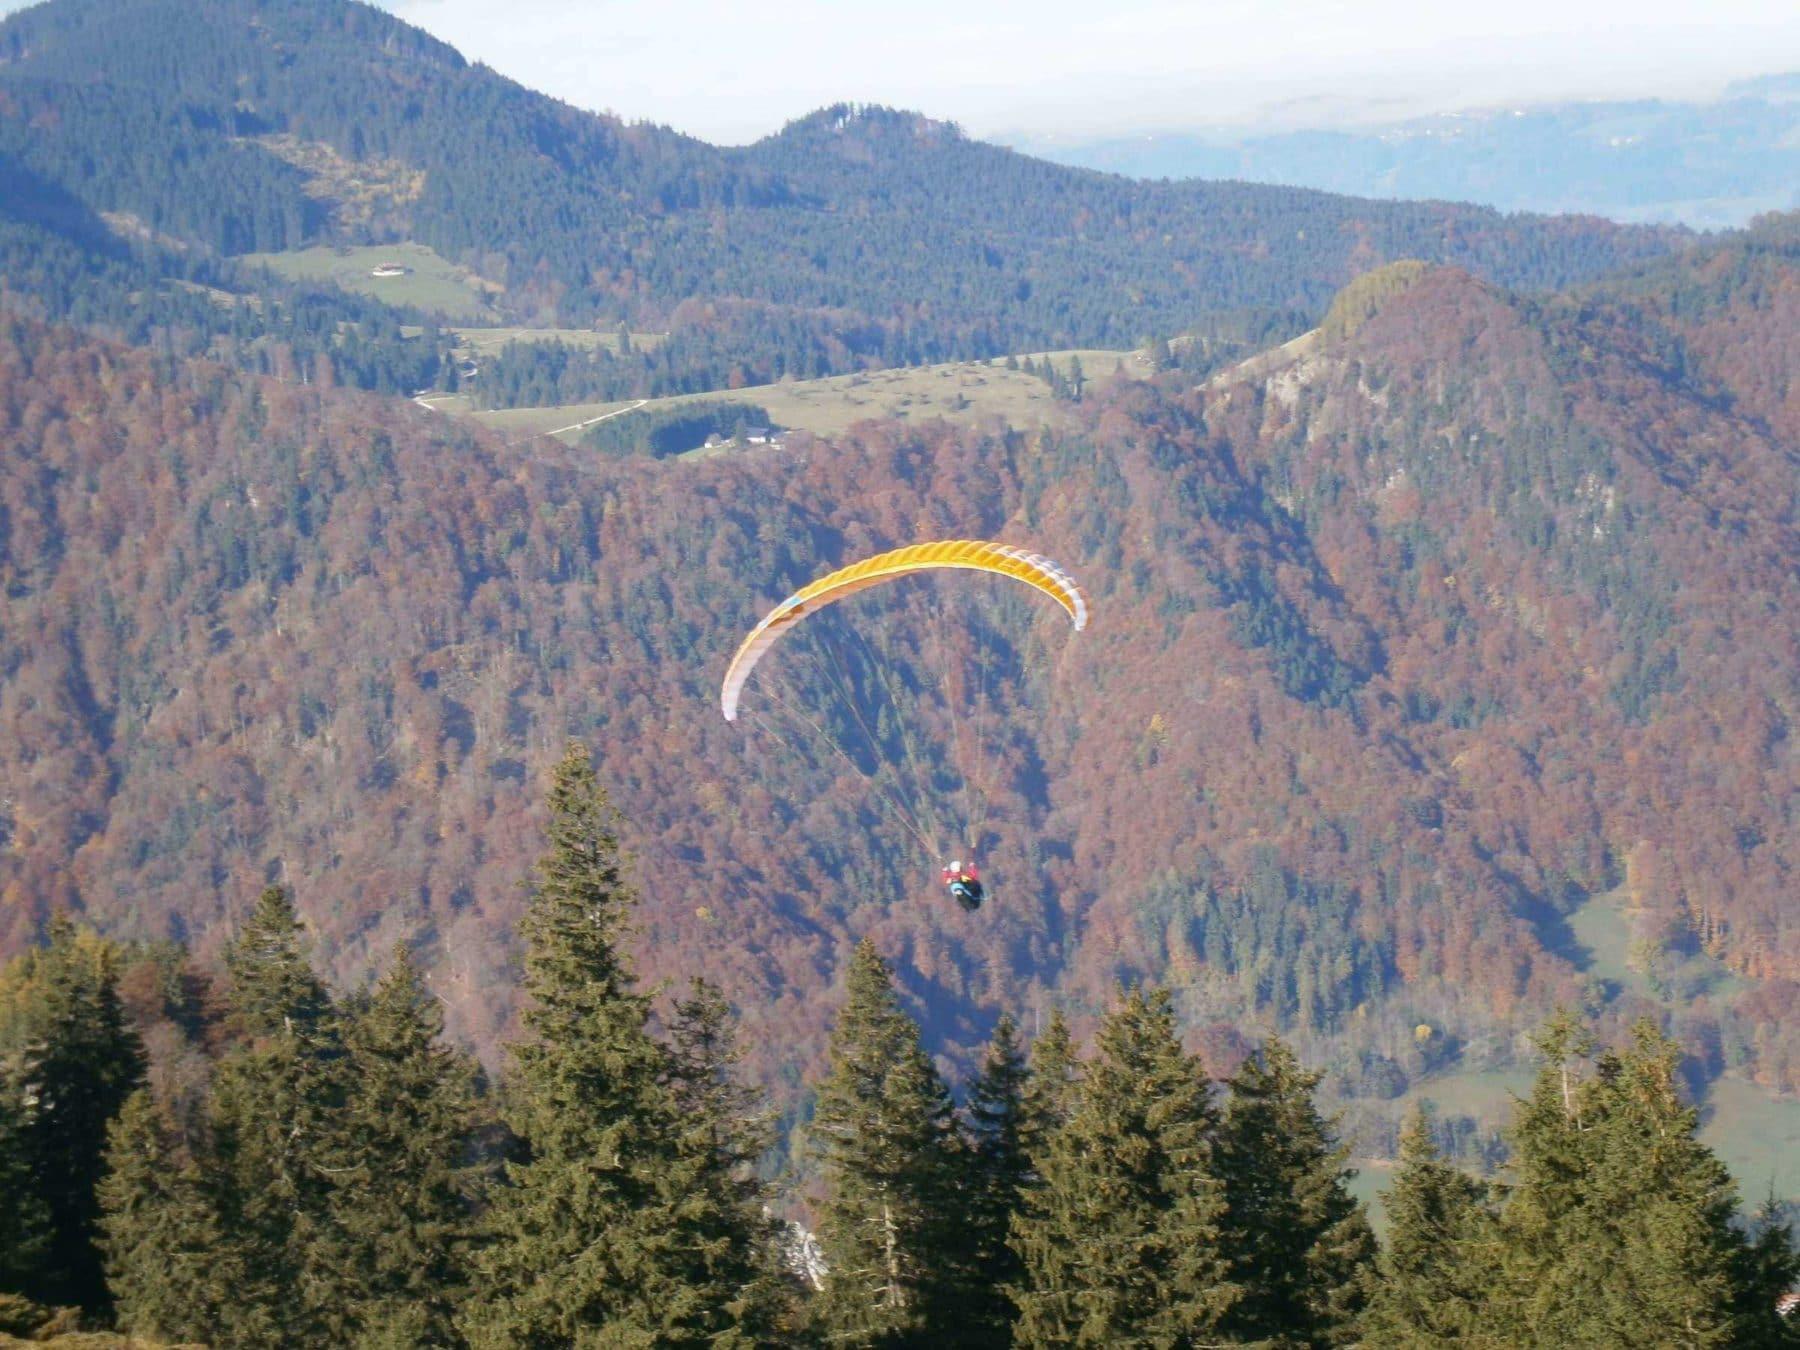 kampenwand-paragliding-2